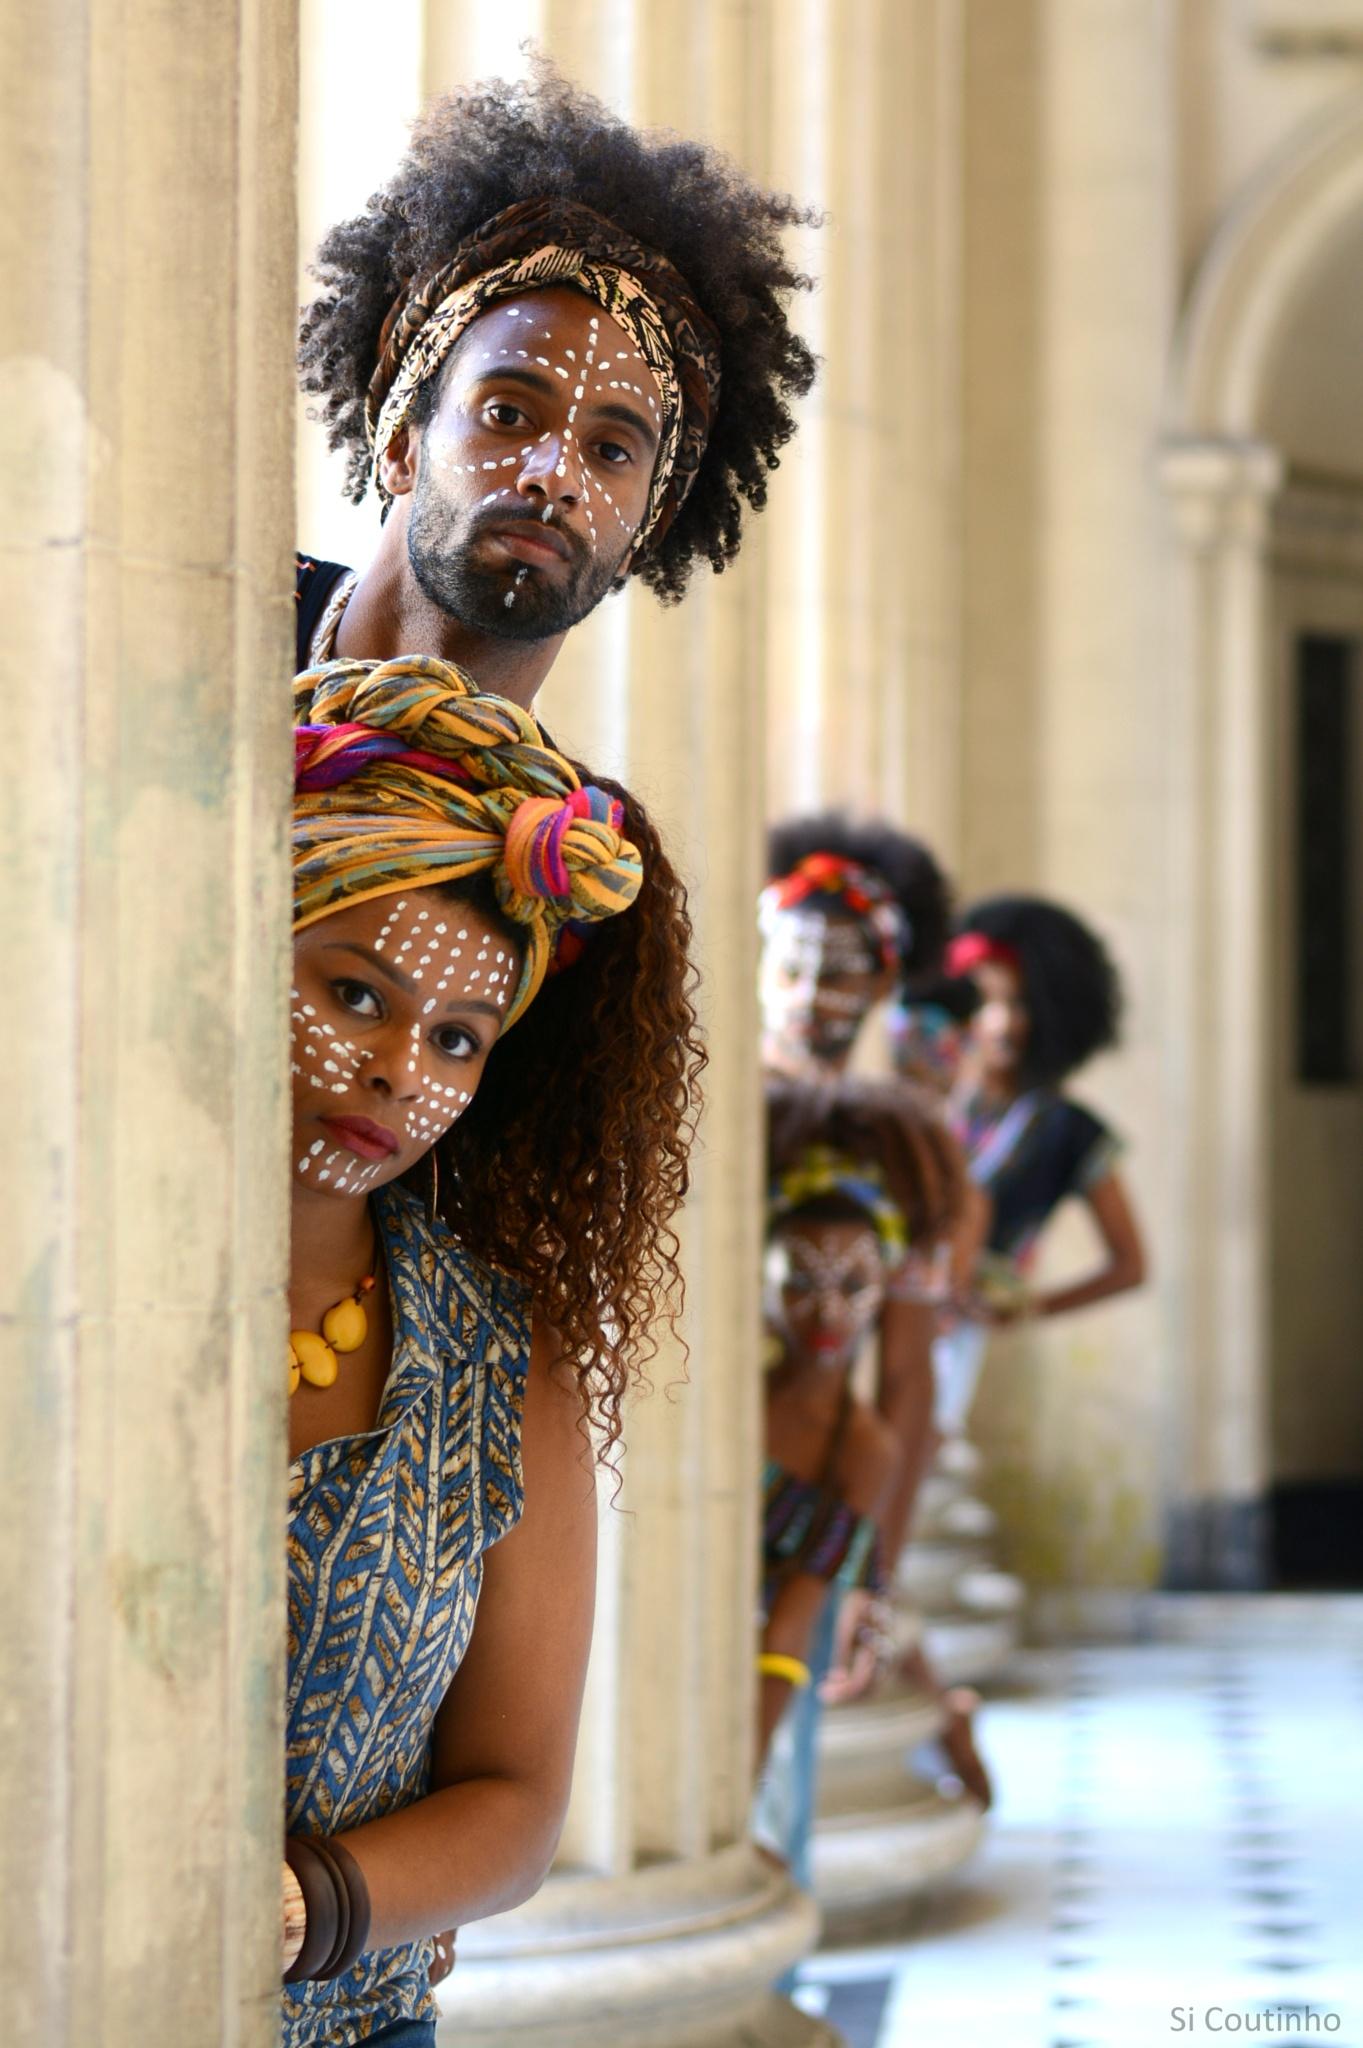 Afro Urbano Tribal by sicoutinhofotografia